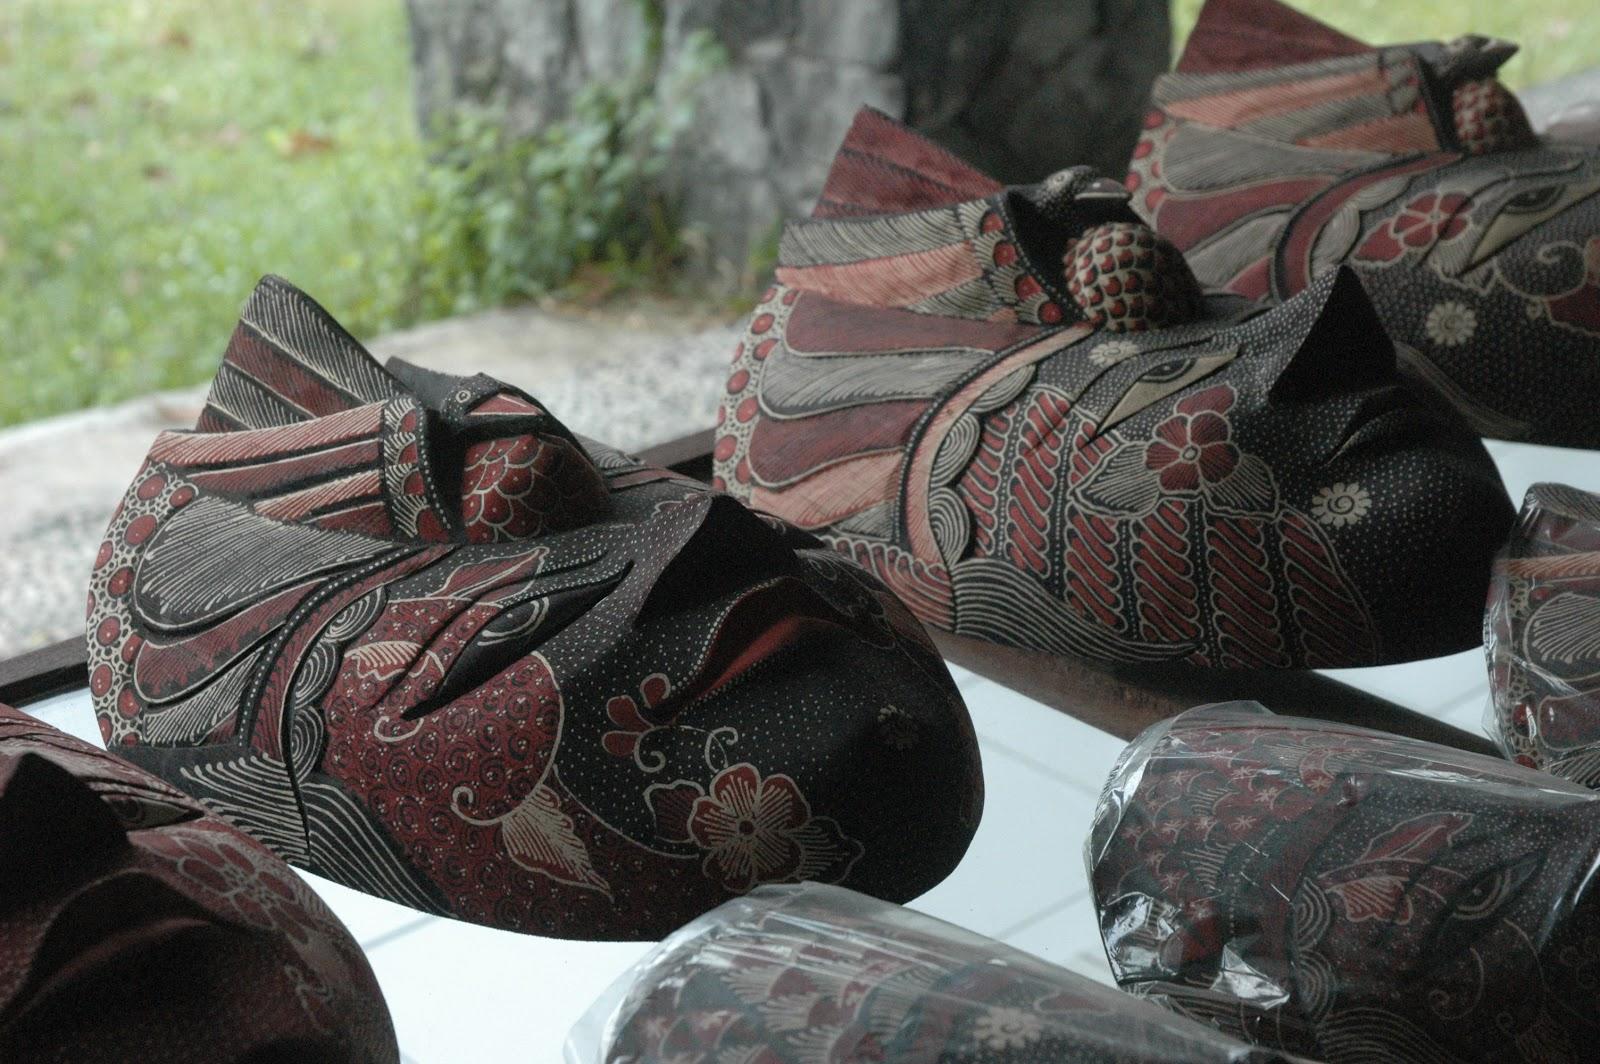 Desa Wisata Krebet Kerajinan Batik Kayu Dimilikinya Kab Bantul